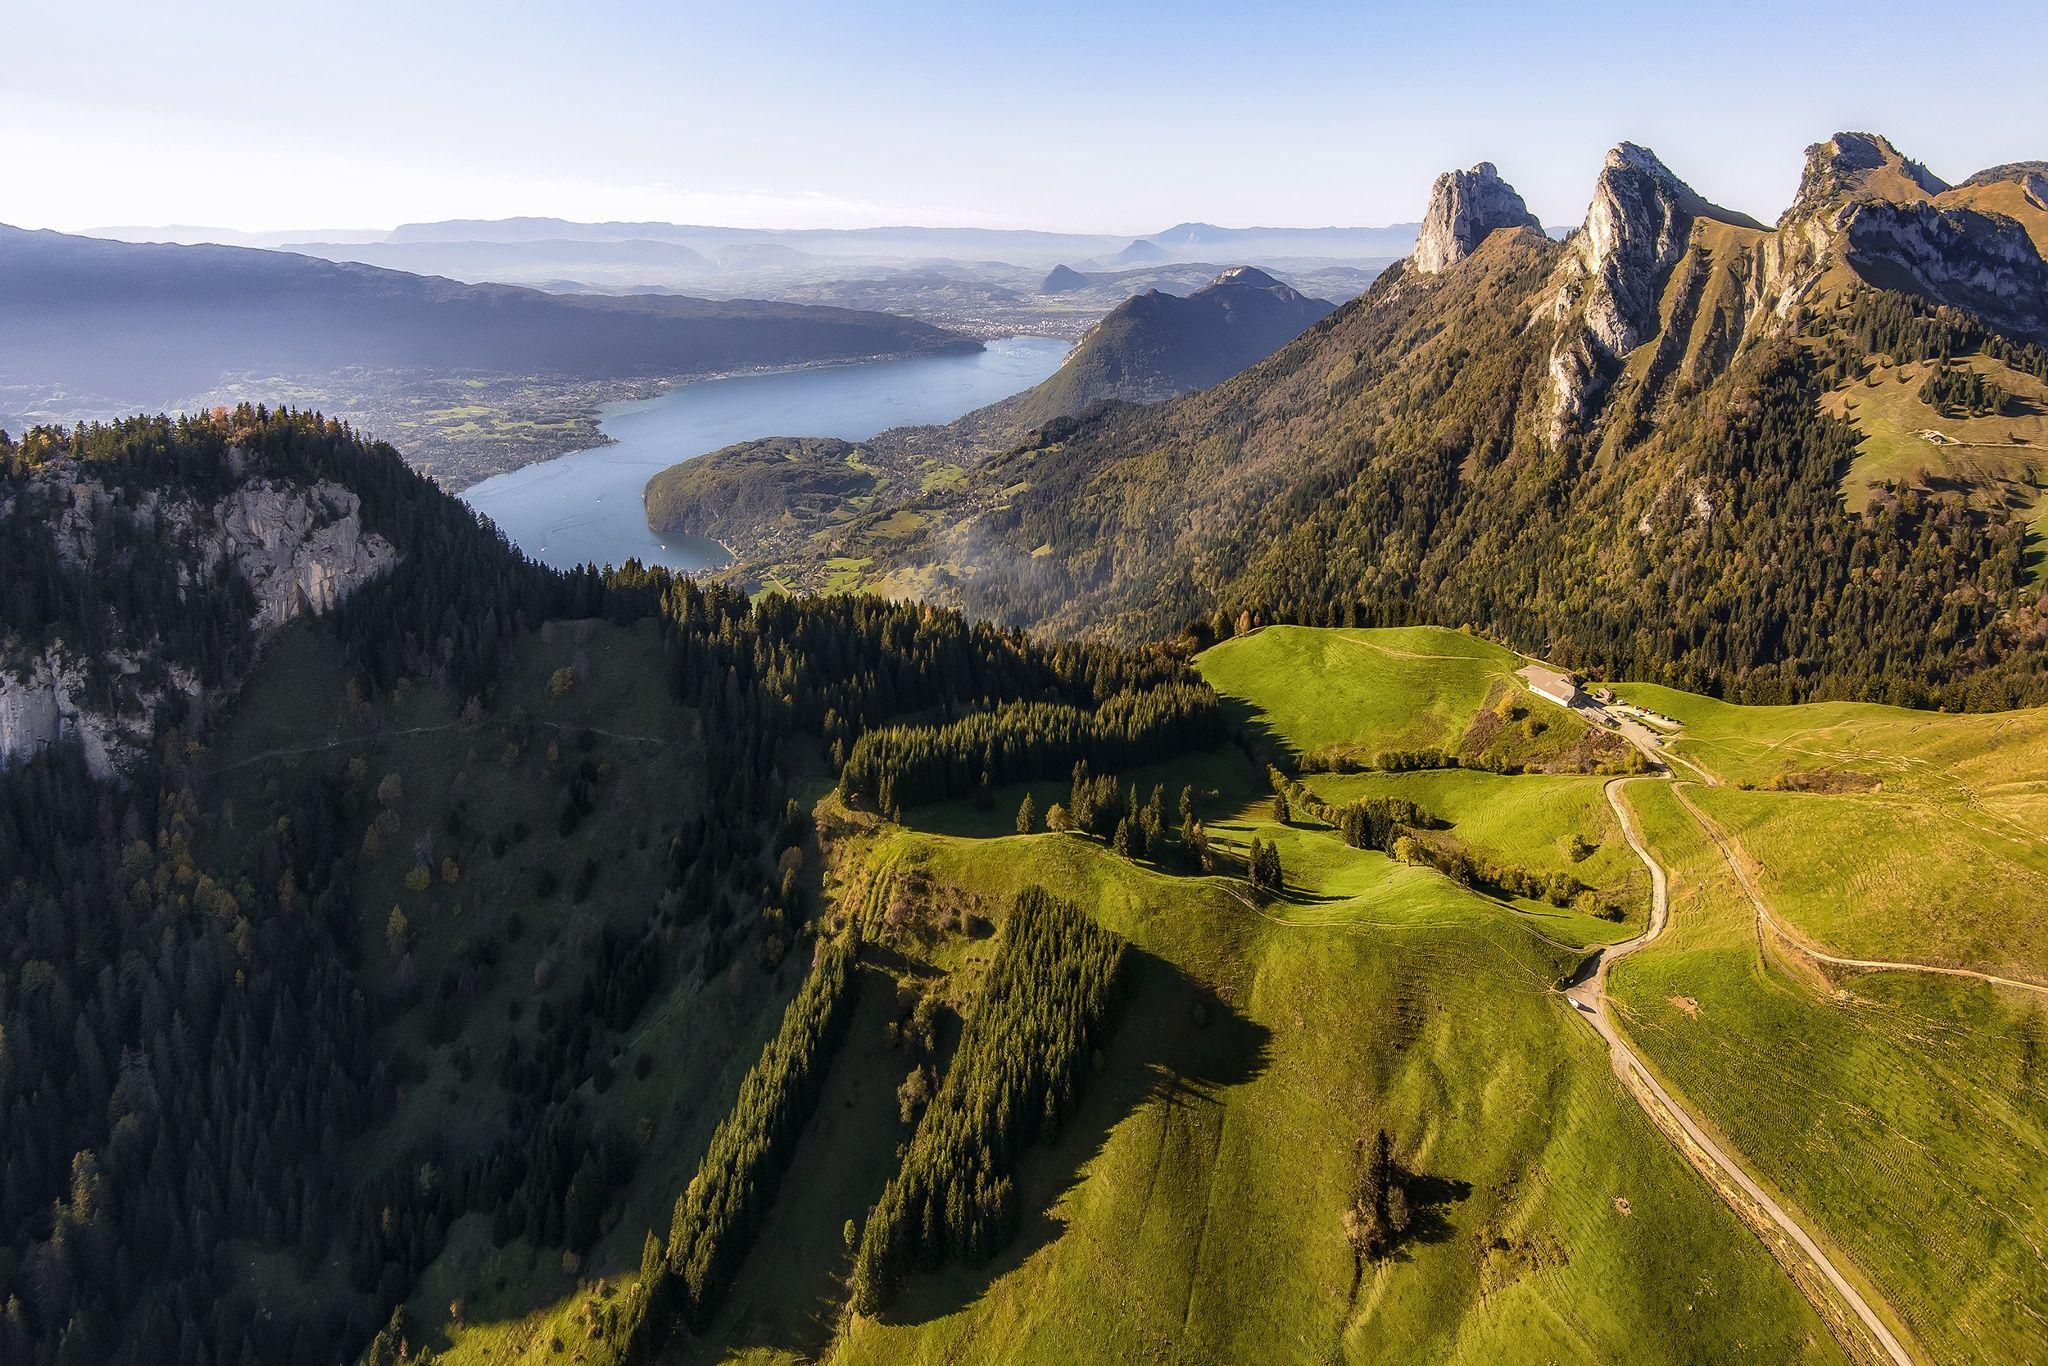 Vista aérea del Lago Annecy en los Alpes franceses (foto de Mr Friks Colors)